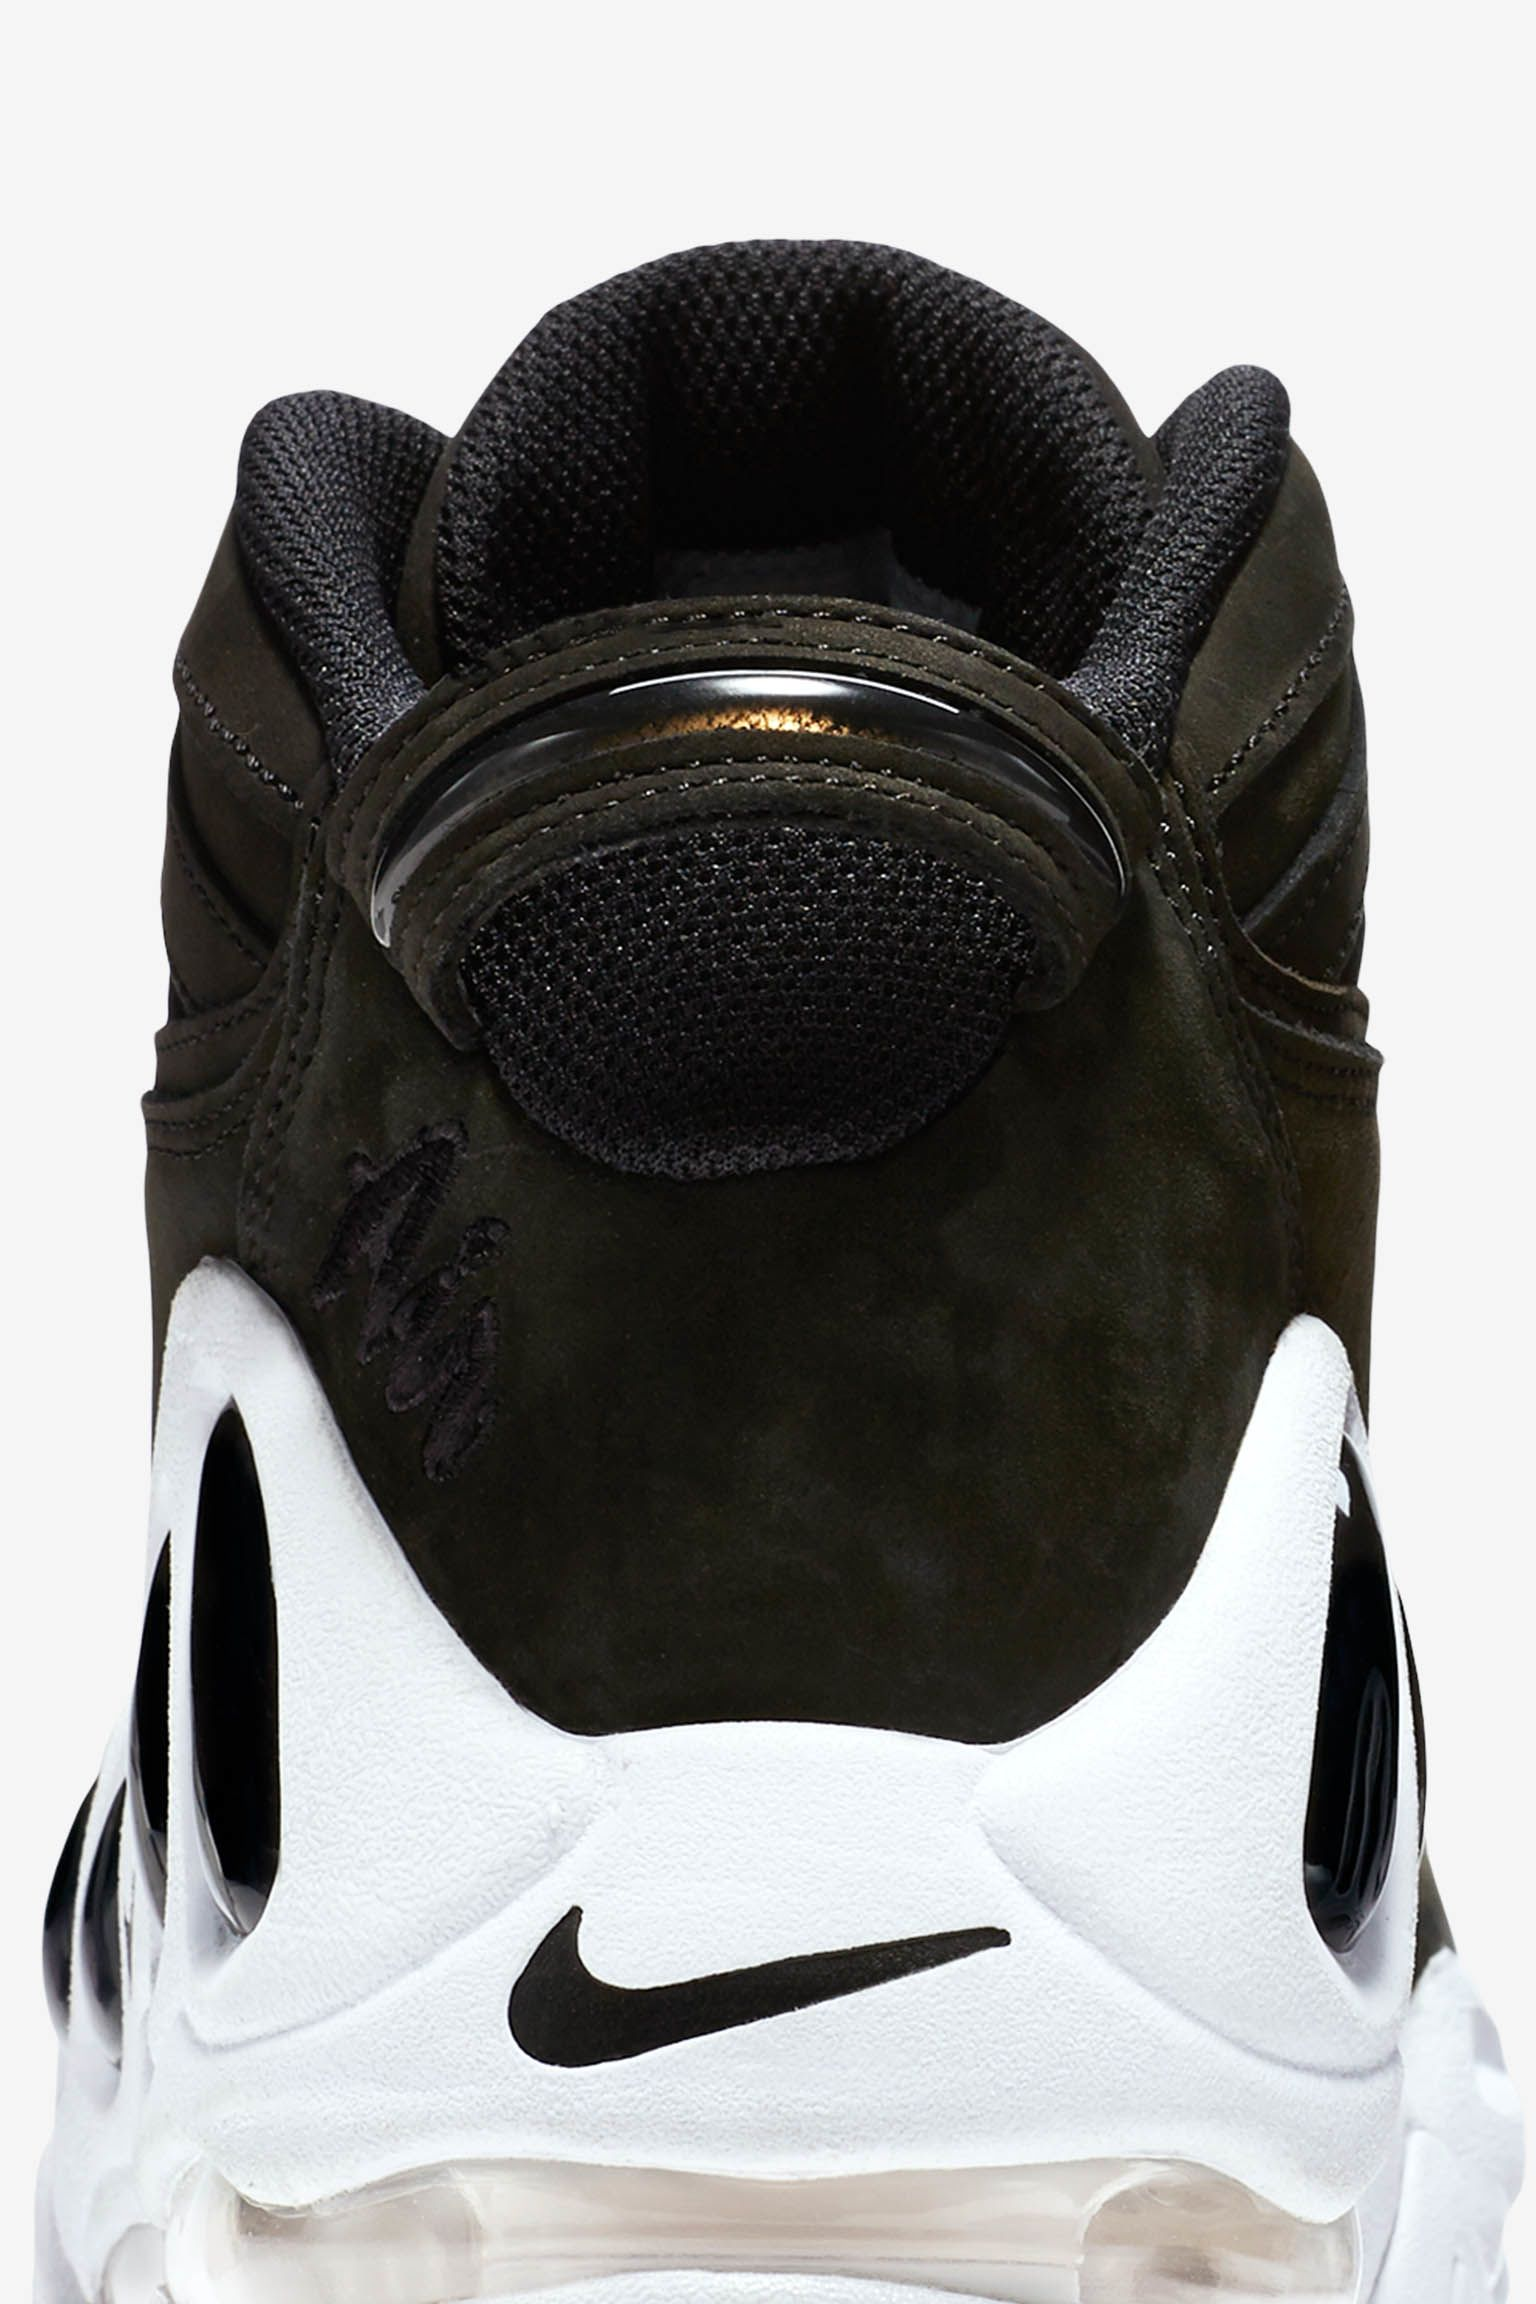 Nike Air Max Uptempo 97 'Black & White'